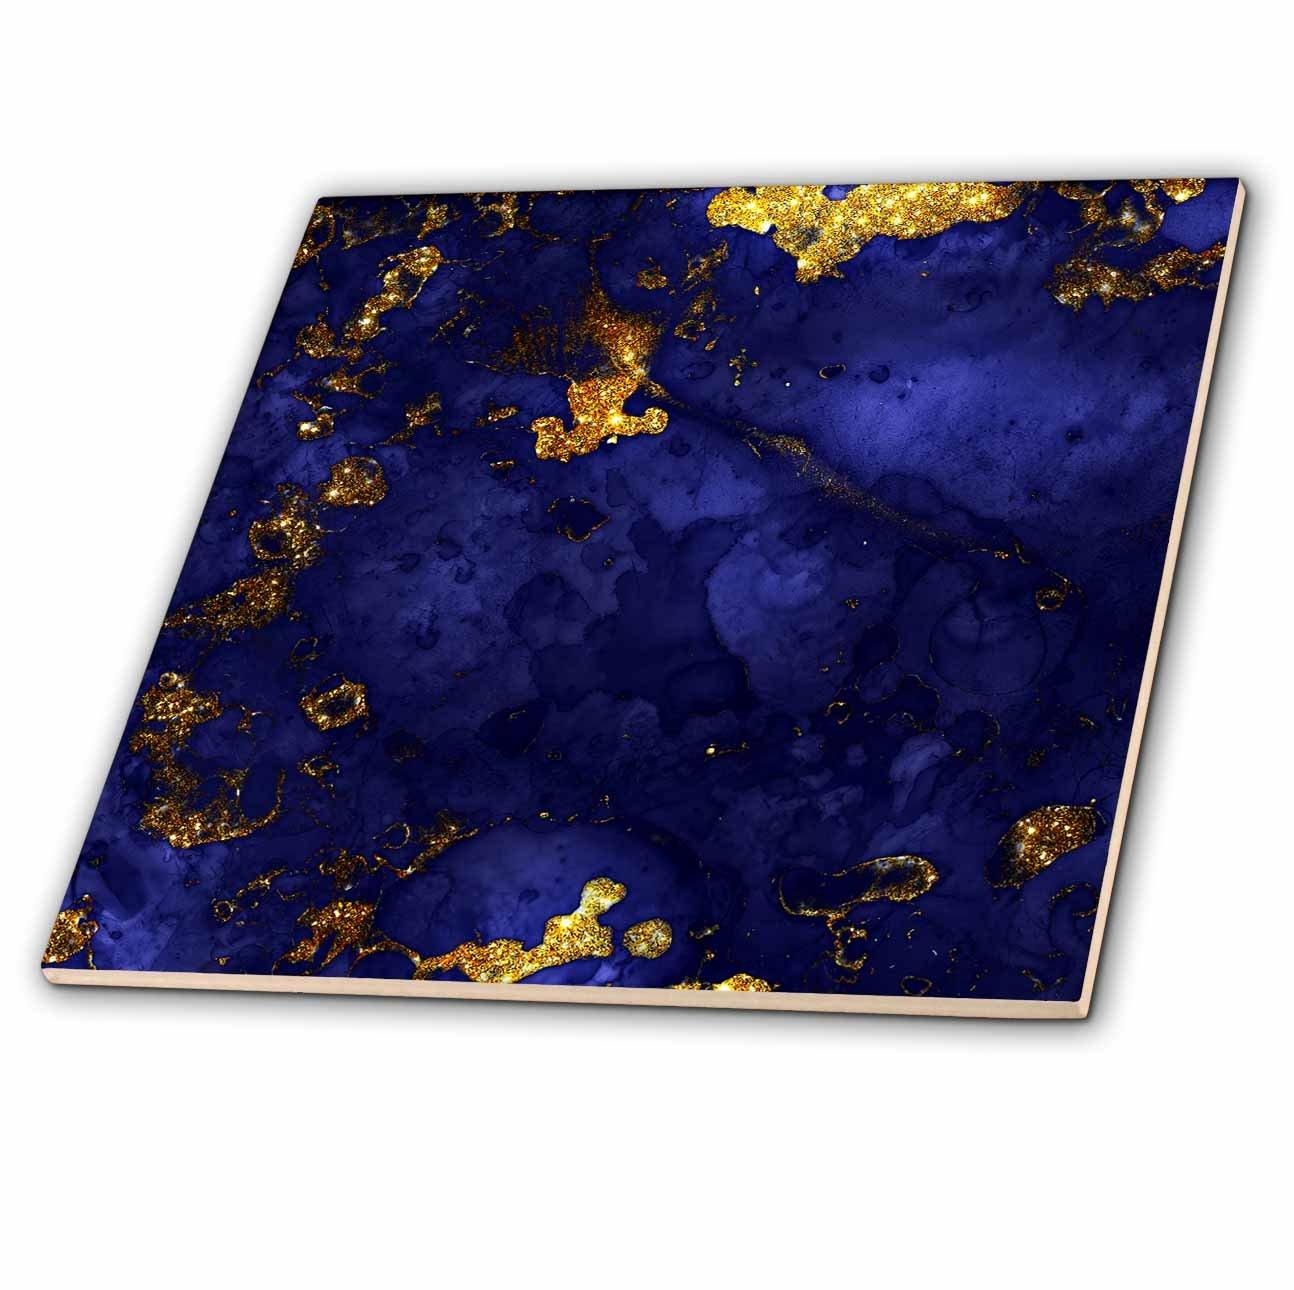 3dRose Uta Naumann Faux Glitter Pattern Image of Trendy Indigo Blue and Green Glitter Ink Metal Marble Agate ct/_275090/_7 8 Inch Glass Tile